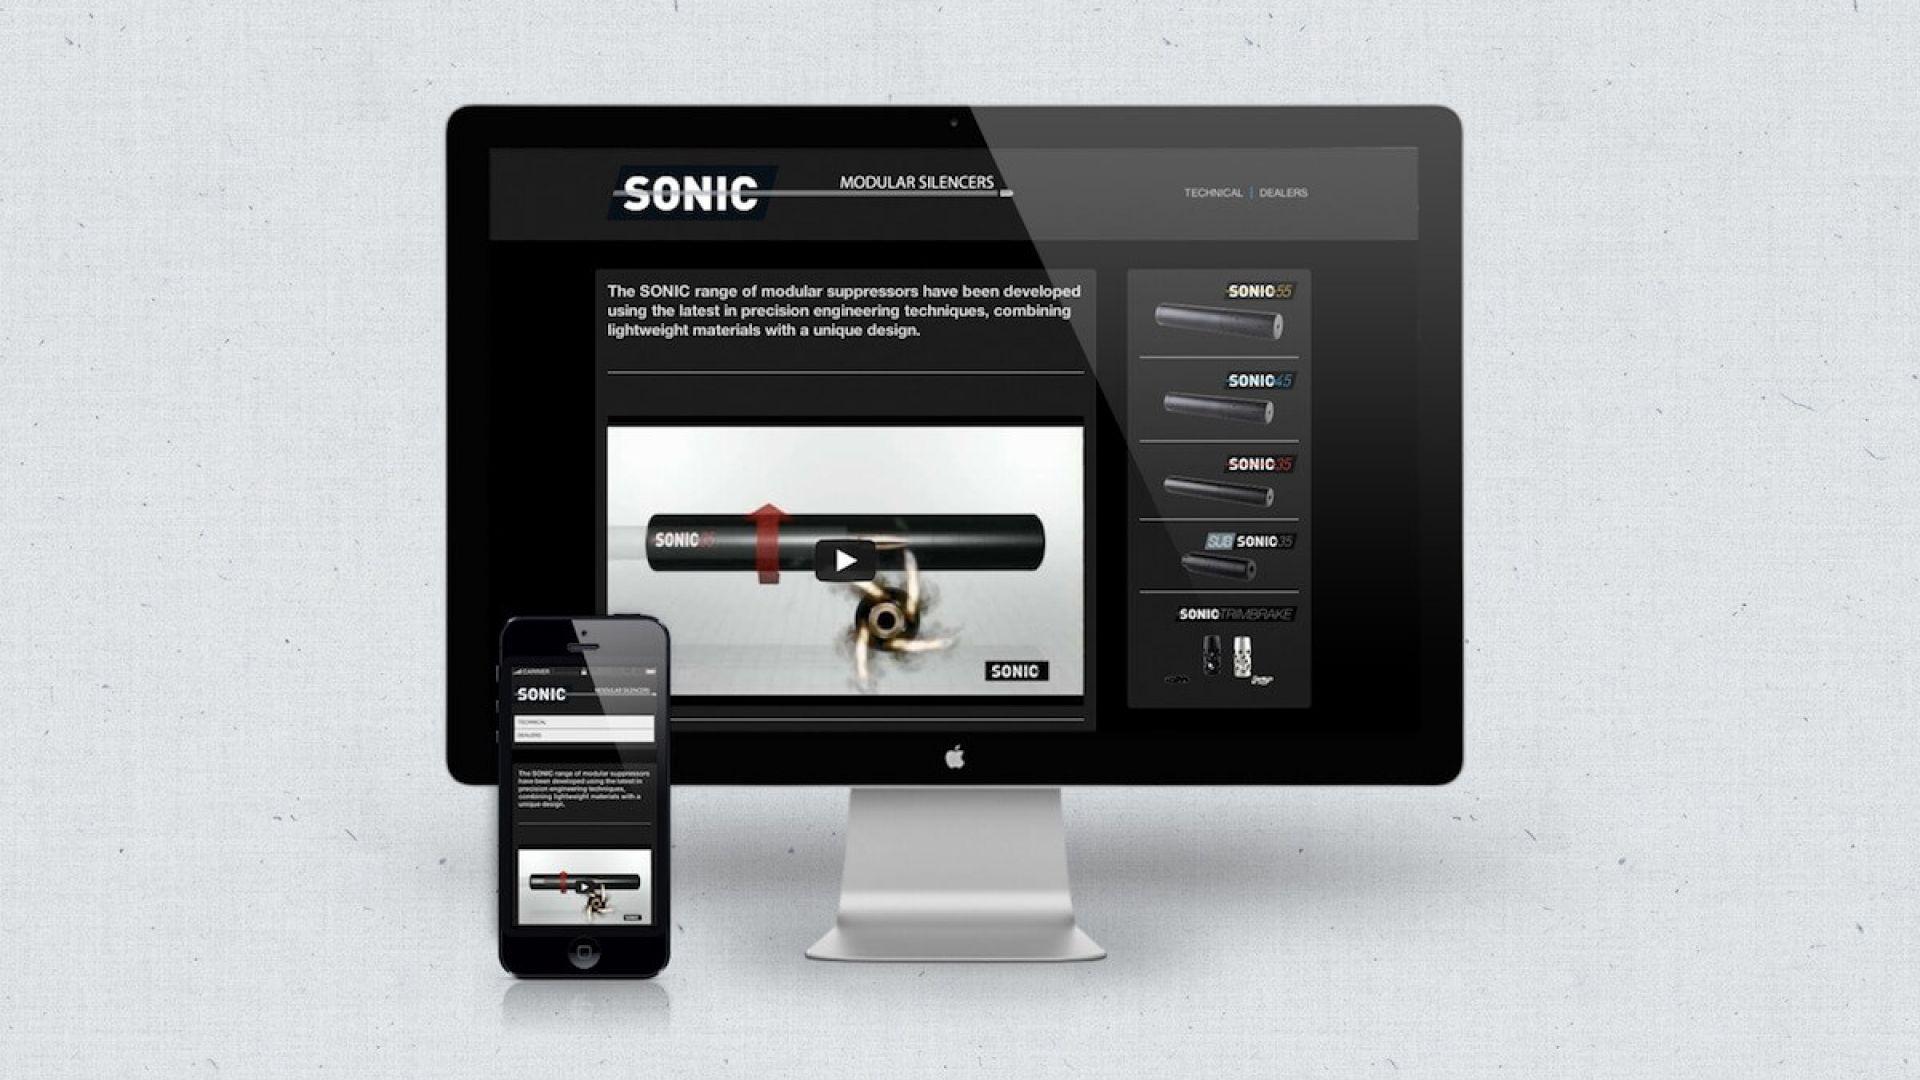 sonice.jpg